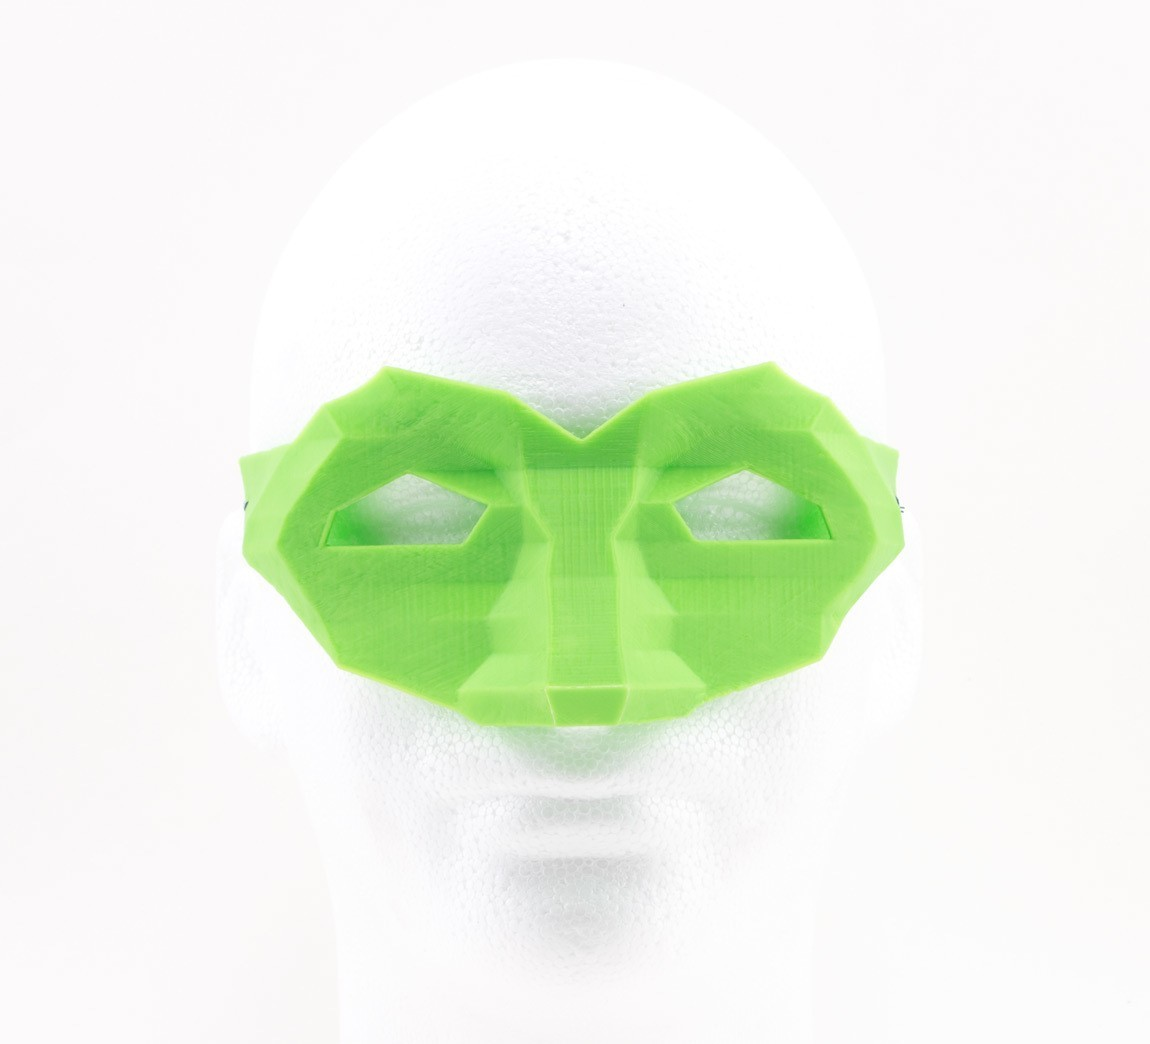 27cf480d69dc6e31c3f473c33fa69e8c_1443223997169_NMD000210-100_@2x.jpg Download free STL file Masquerade Mask • 3D print model, Lucy_Haribert